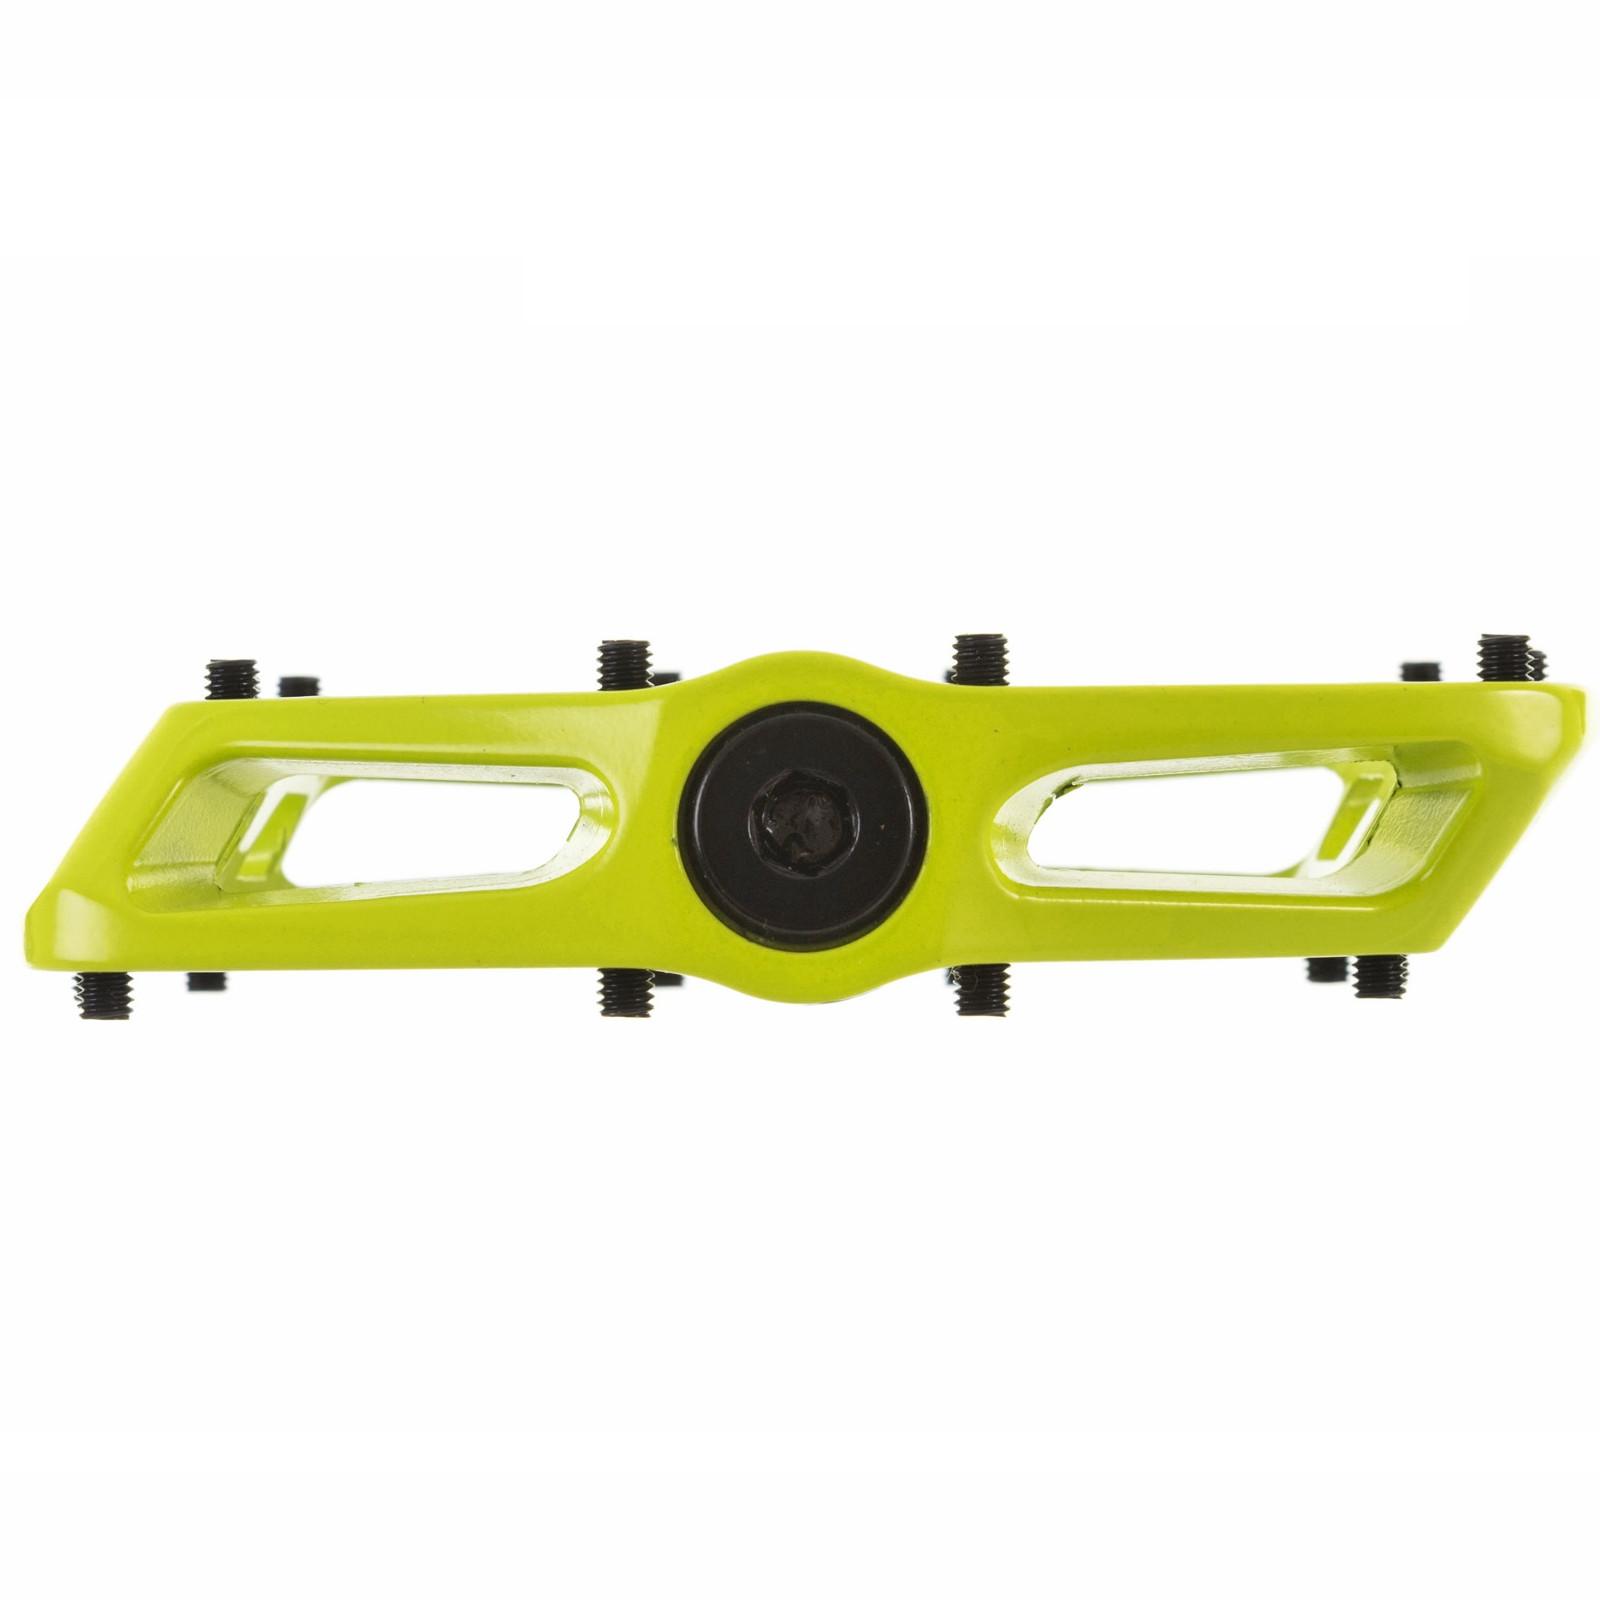 New-Upgraded-Dmr-V8-Lightweight-Flat-Platform-Bike-Pedals-9-16-034 thumbnail 9